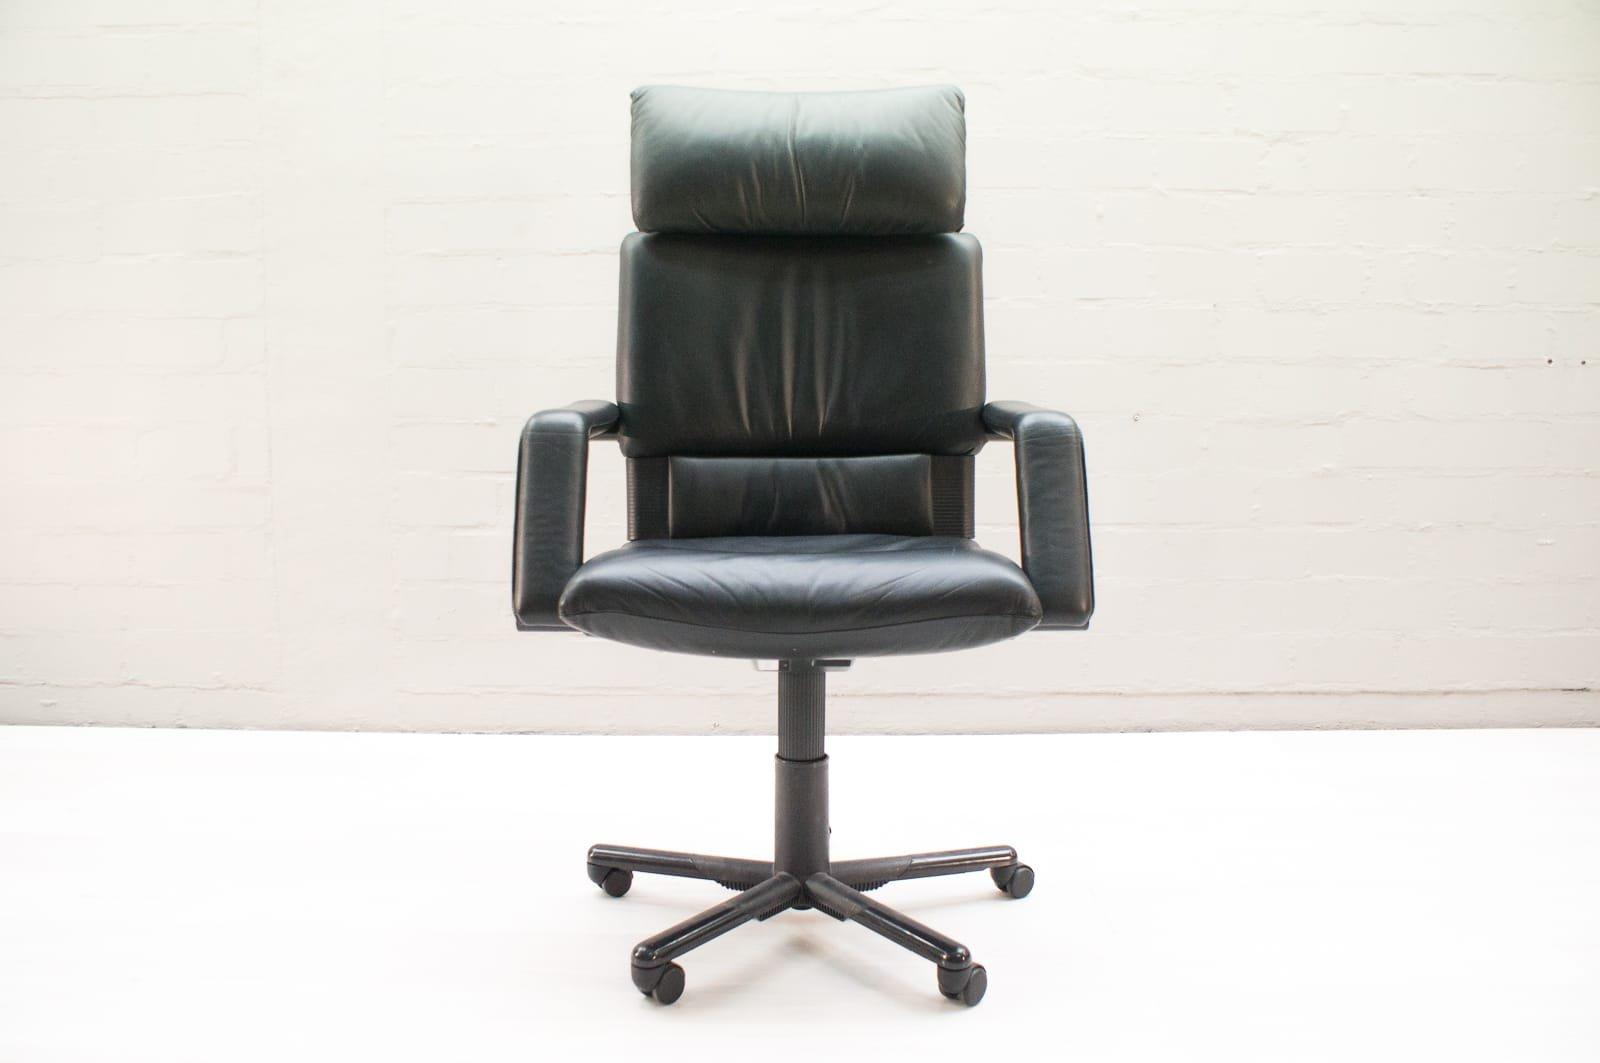 Stokke Ergonomische Stoel : Stokke ergonomische stoel ergonomischer burostuhl